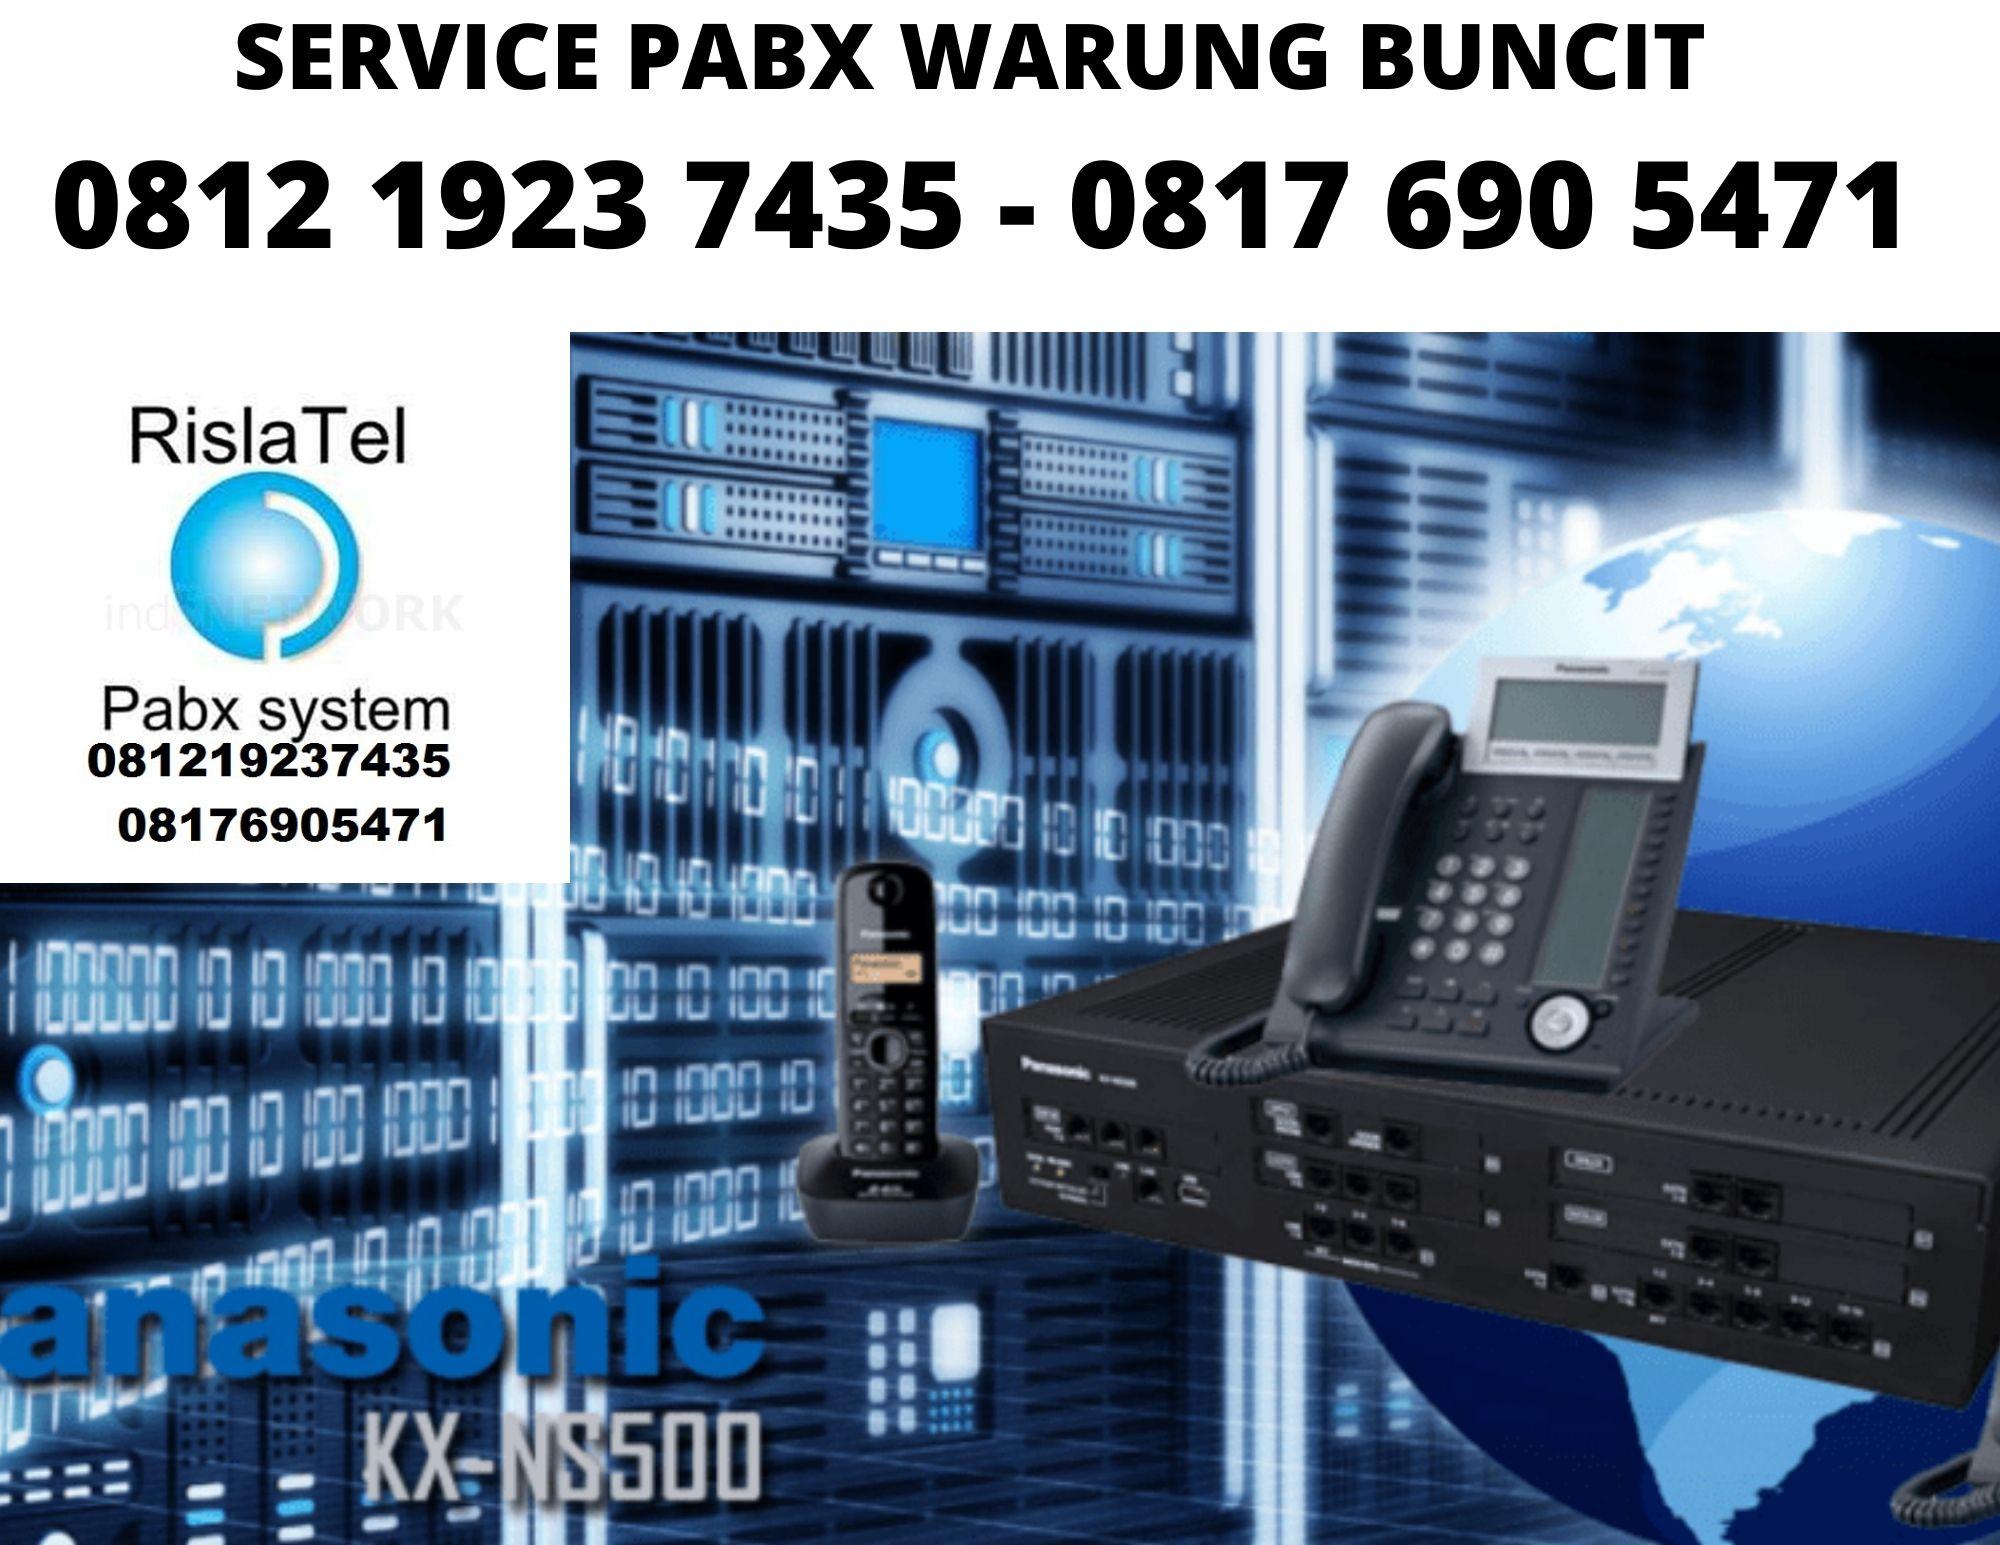 Service PABX Warung Buncit